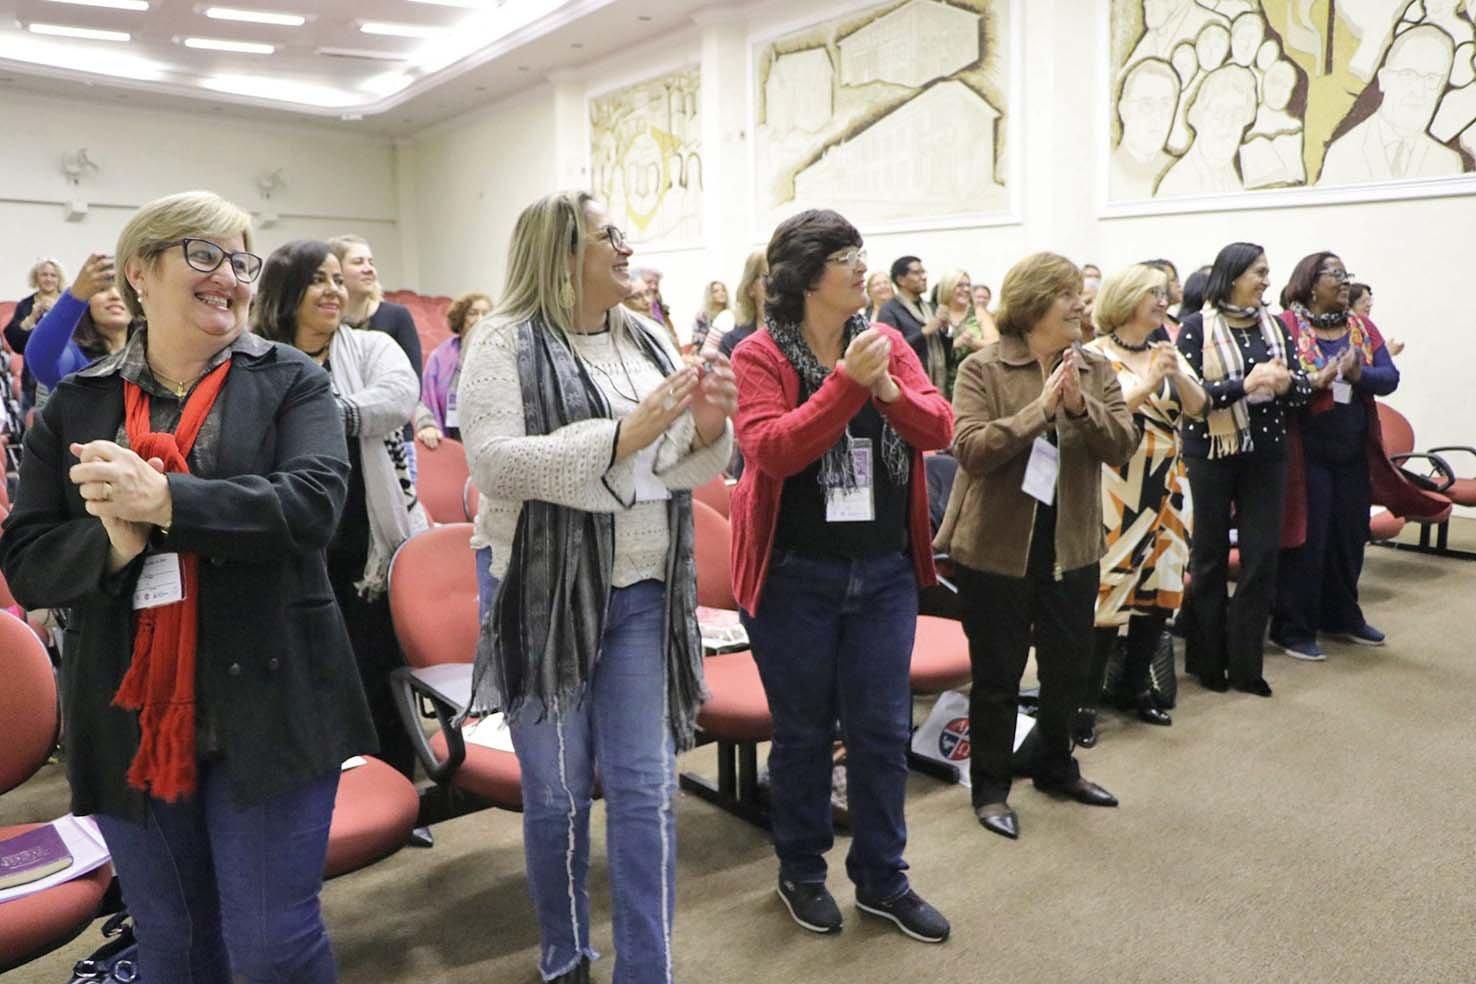 Metodistas participam de Encontro na Faculdade de Teologia